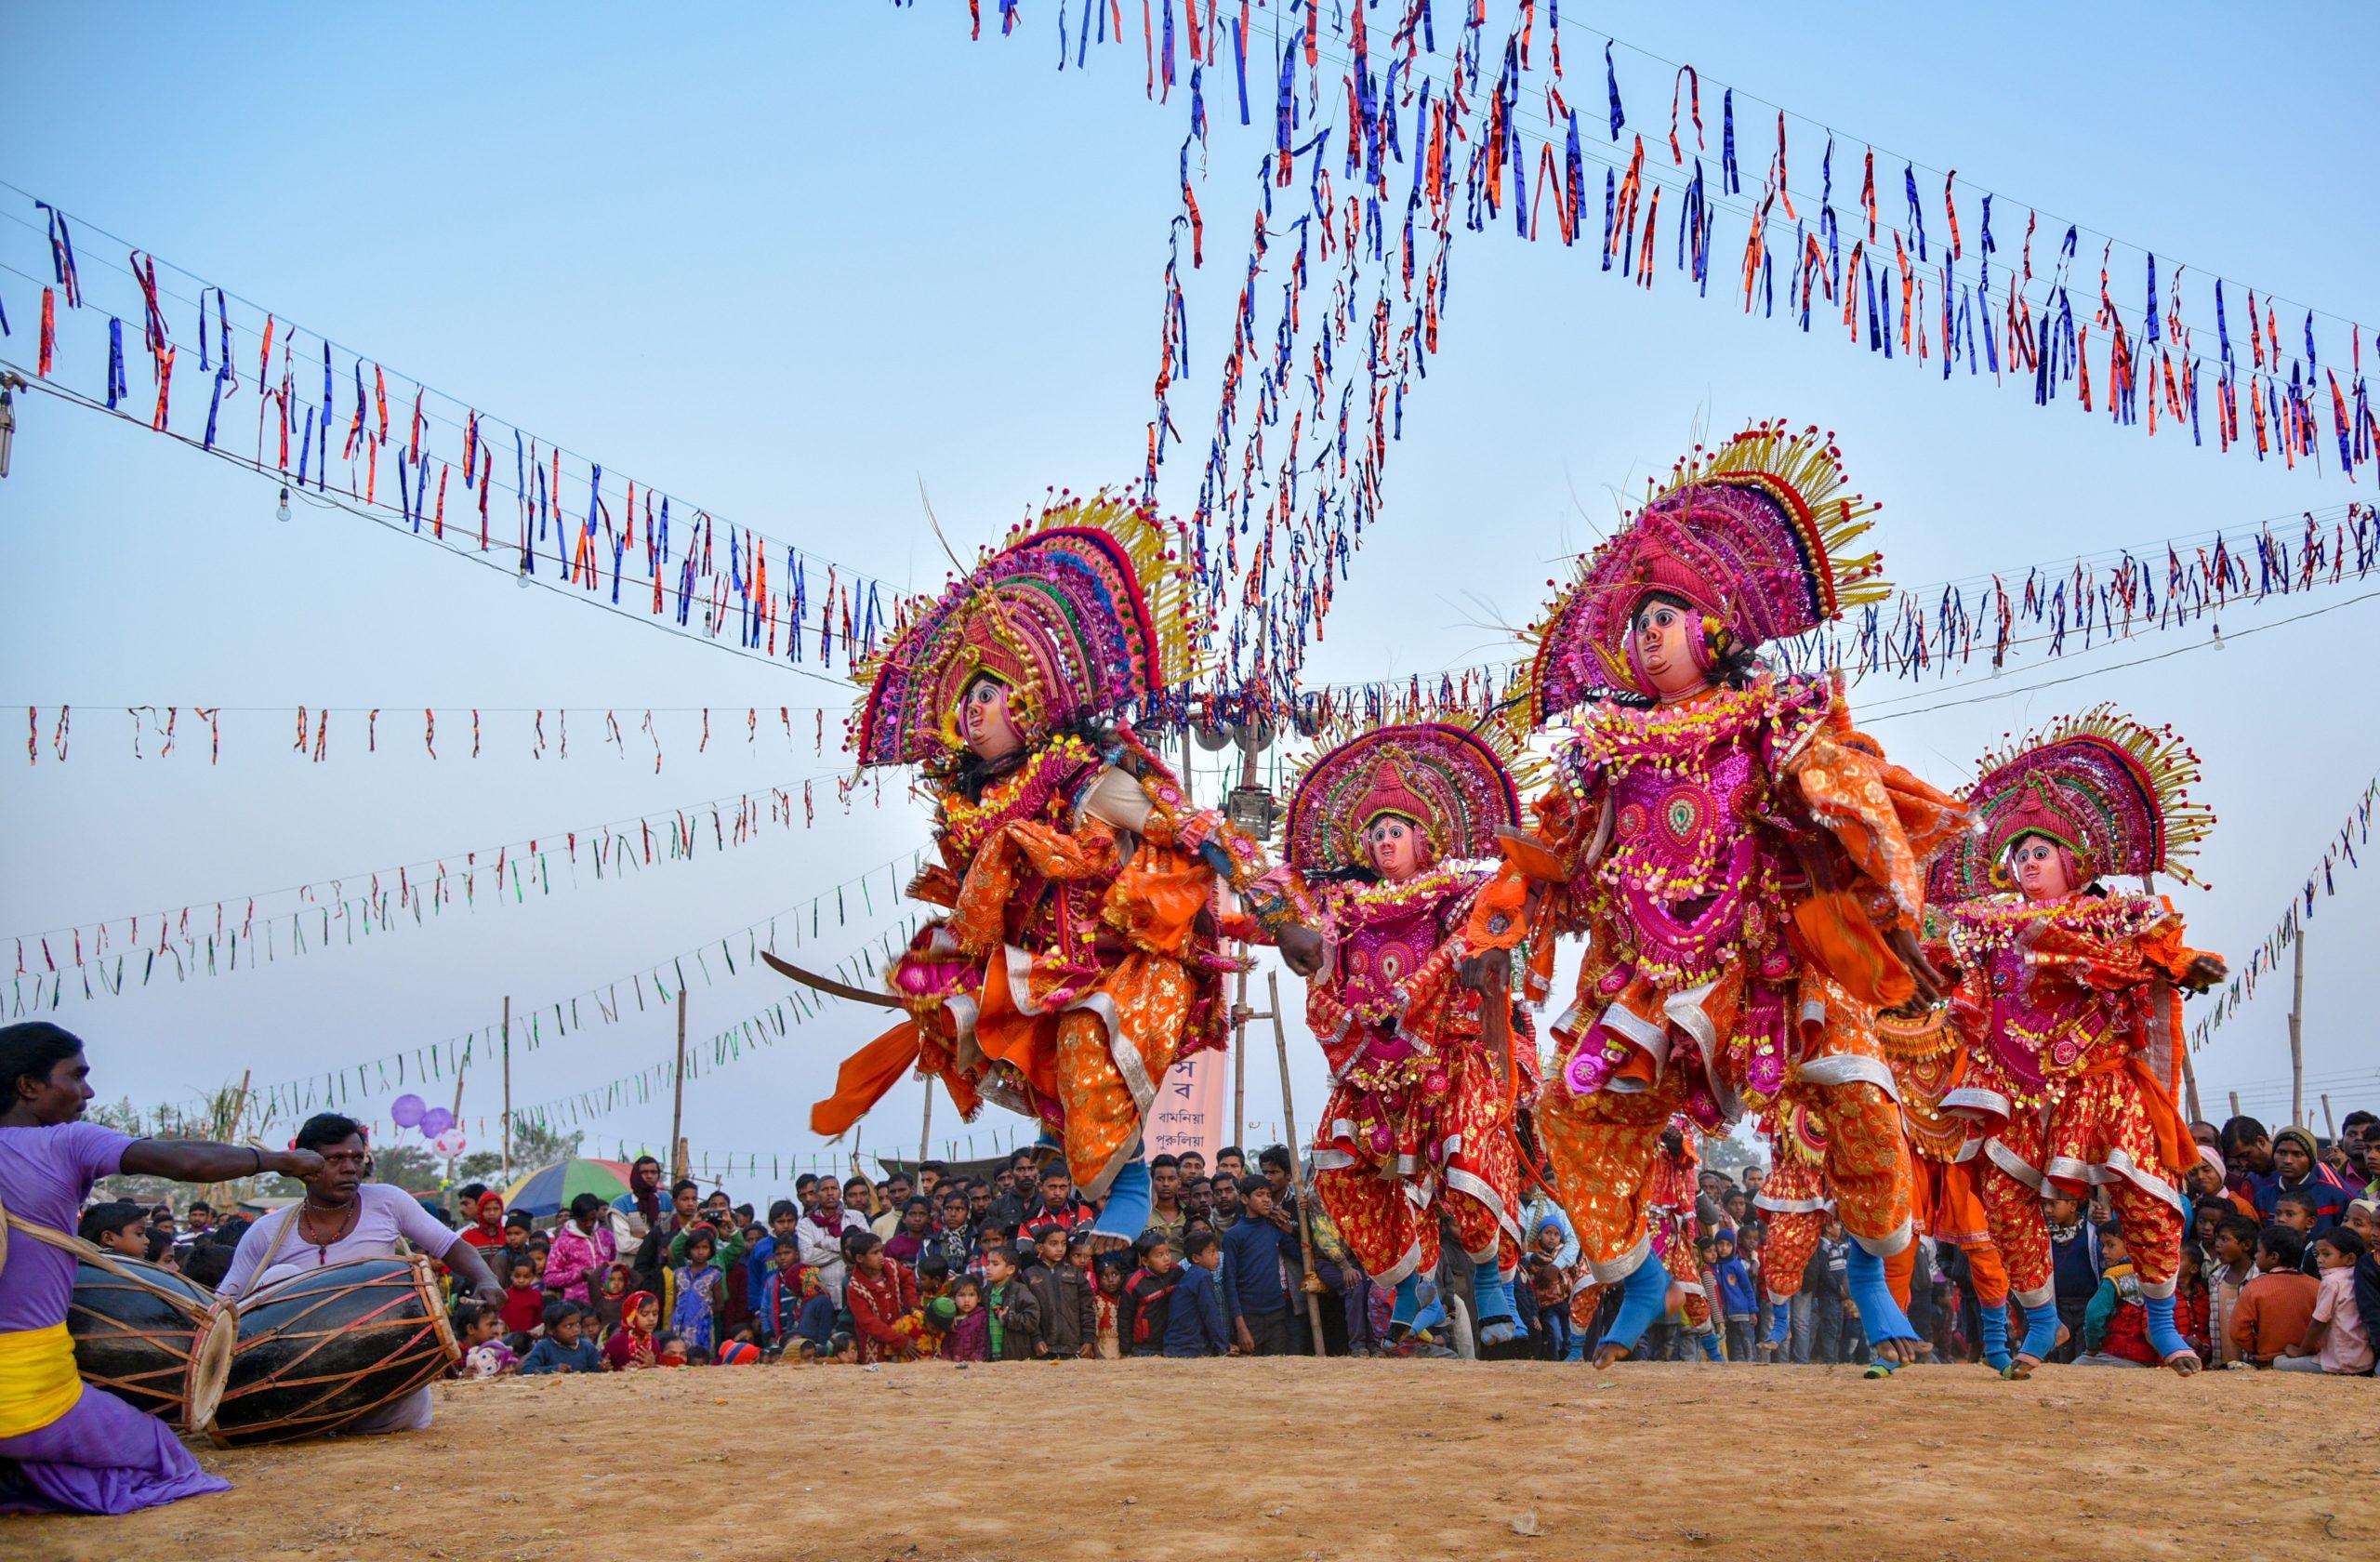 Chhau dance performers